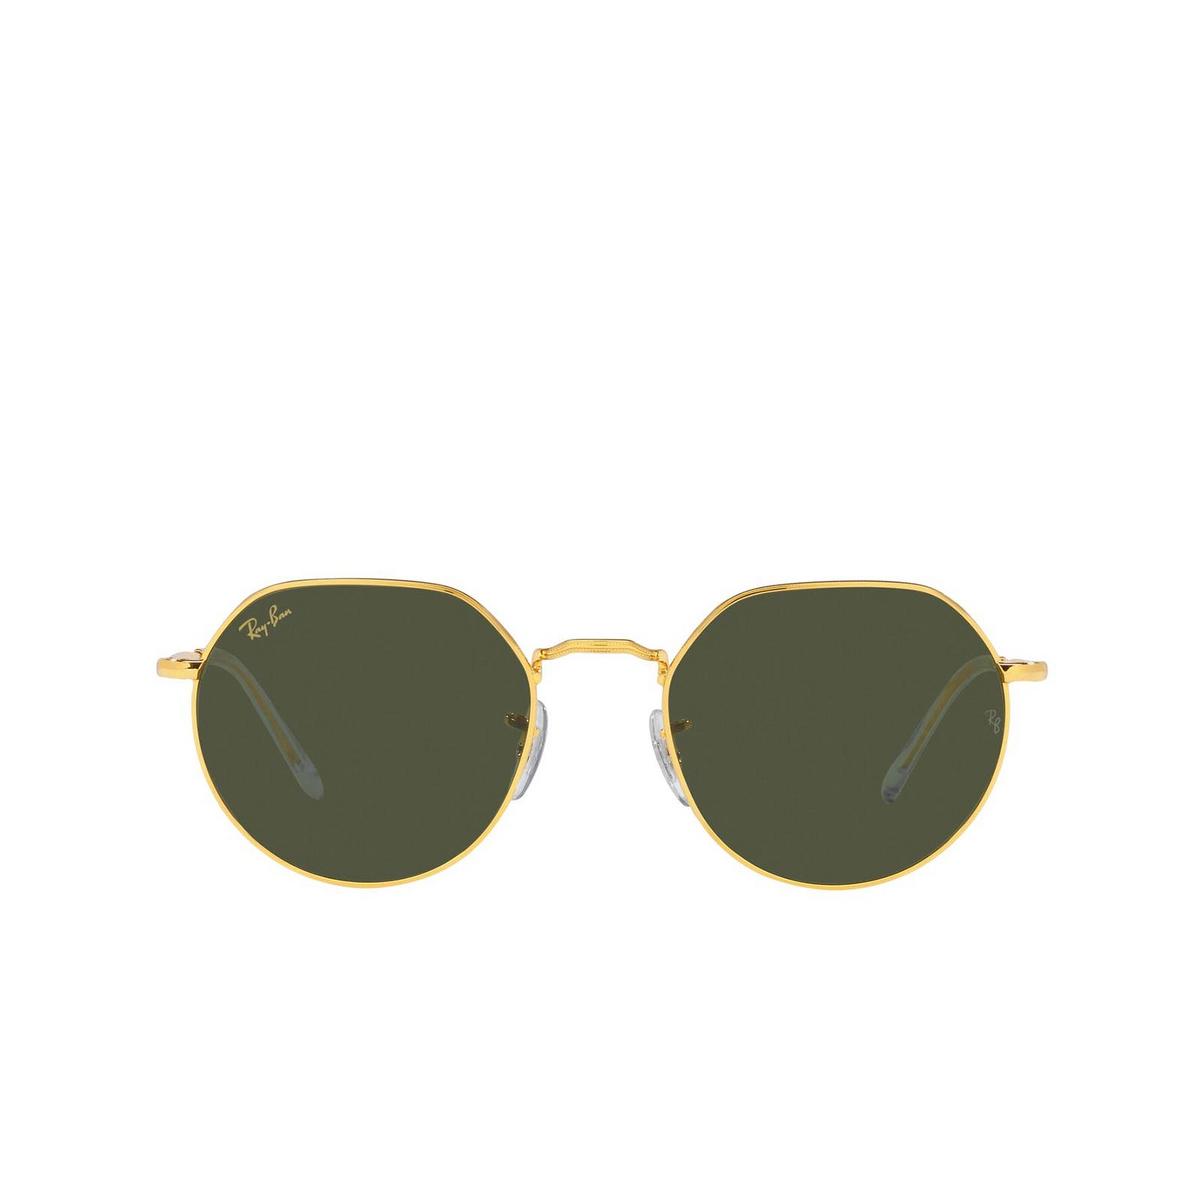 Ray-Ban® Irregular Sunglasses: Jack RB3565 color Legend Gold 919631 - 1/3.